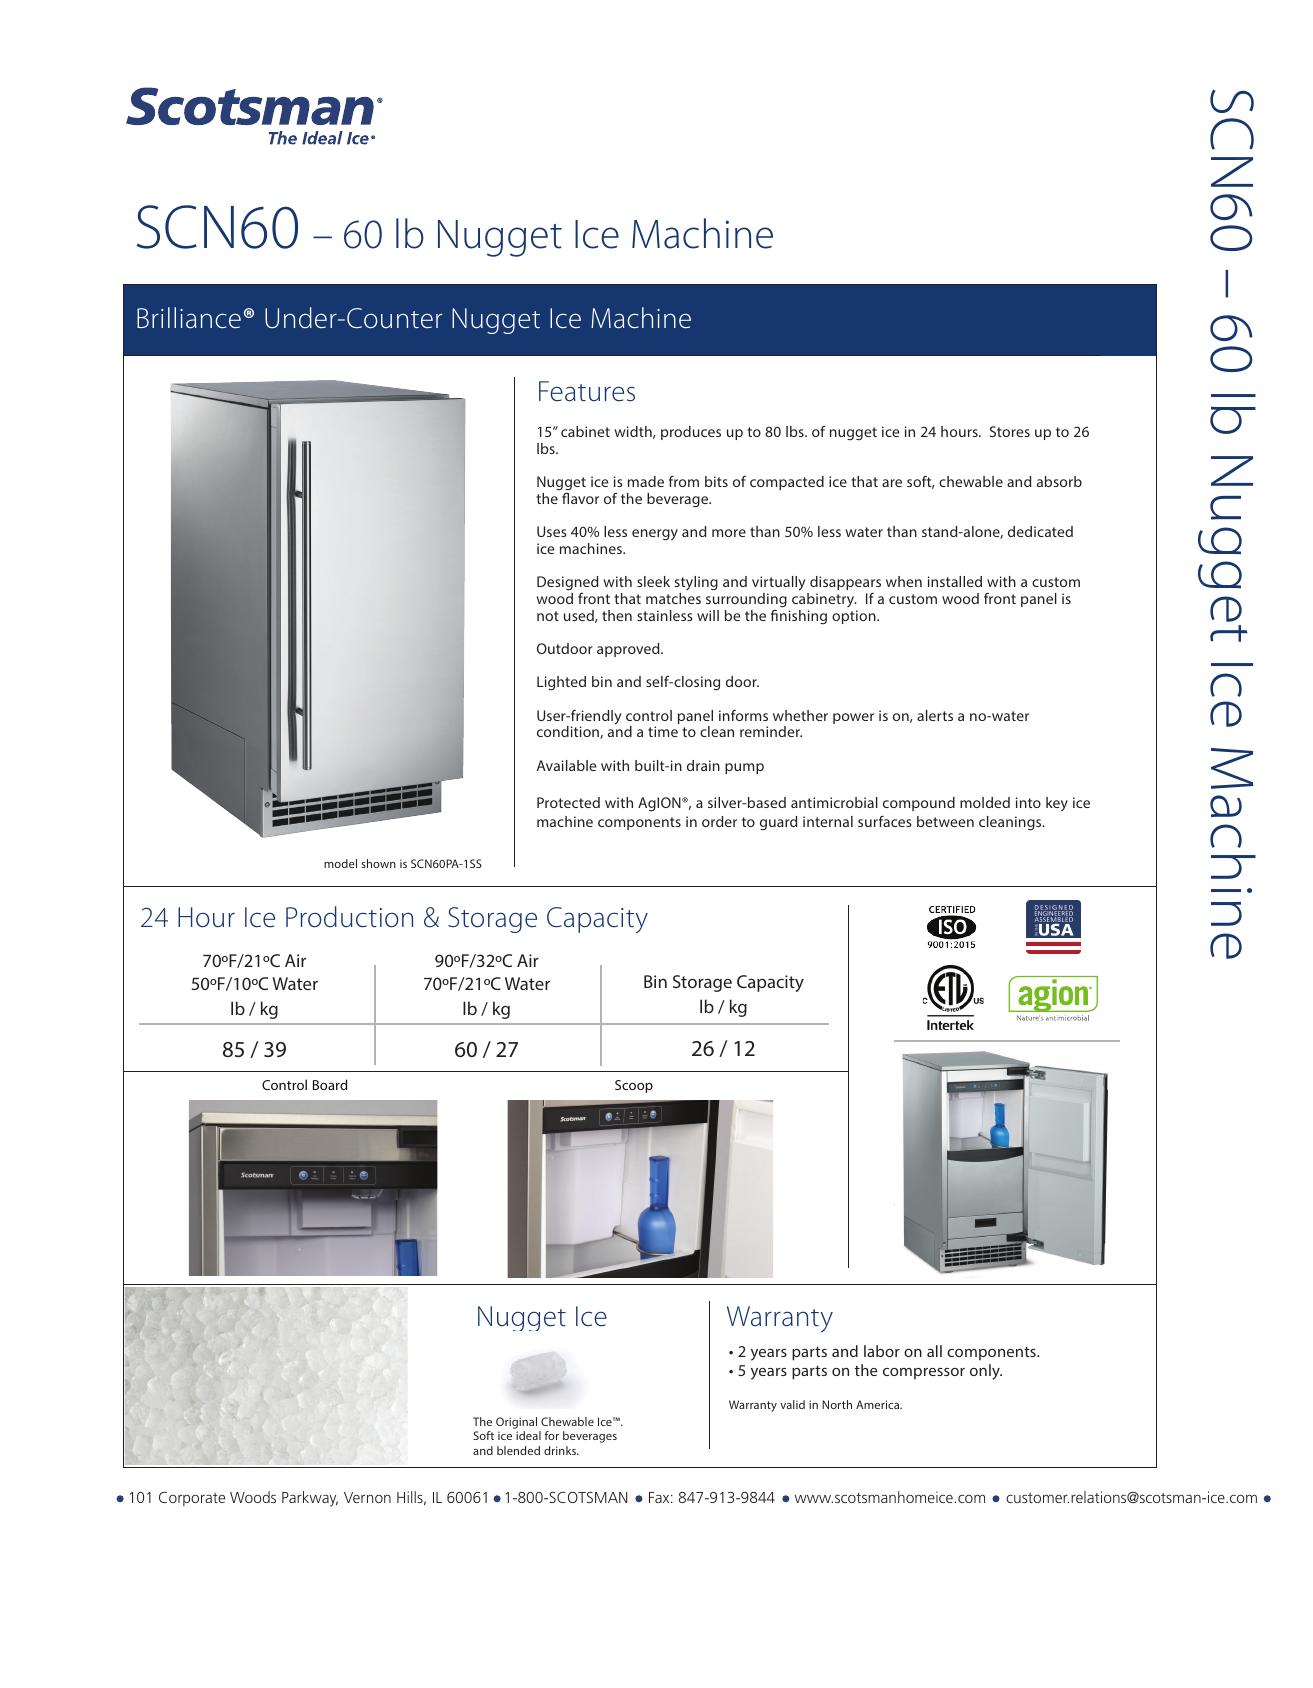 Scotsman Scn60pa1ss Specifications Sheet Manualzz